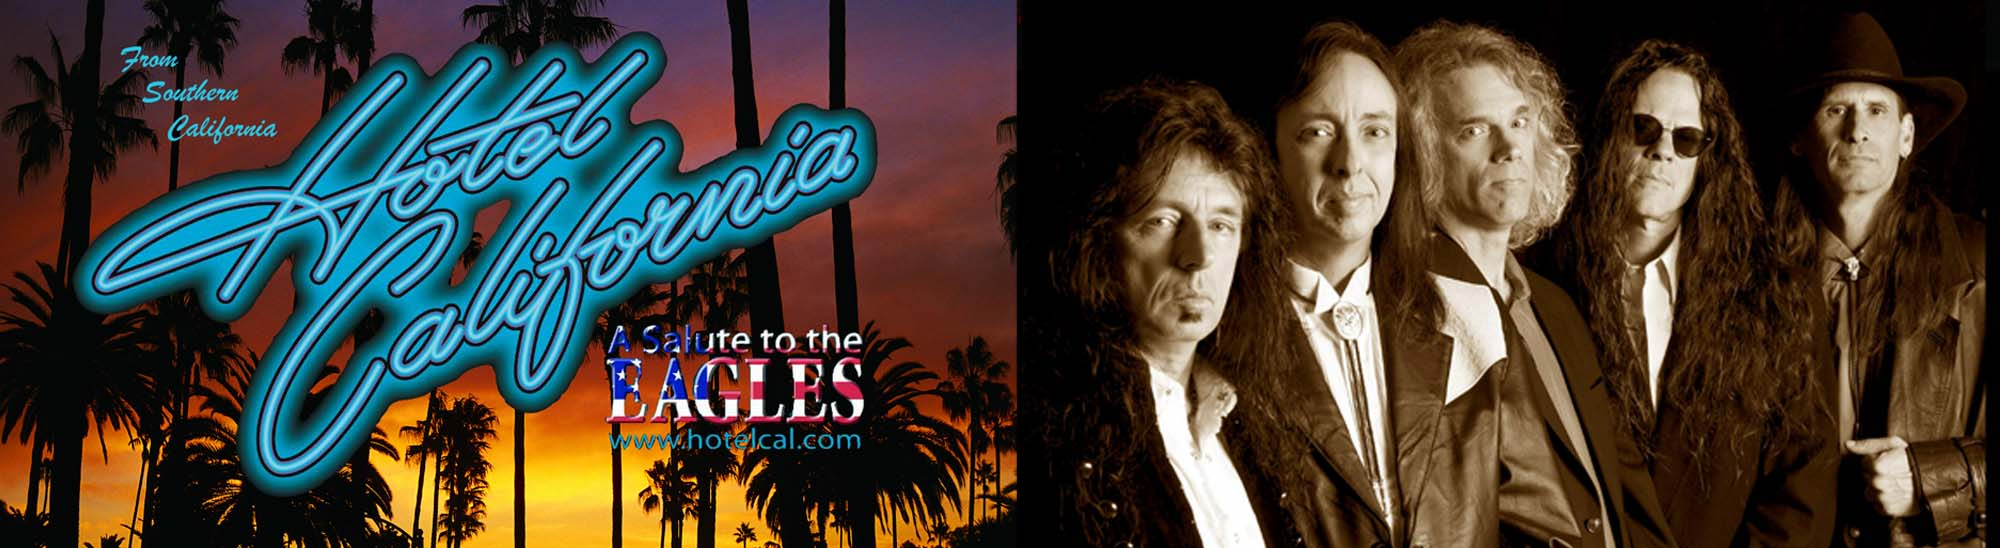 hotel-california-a-salute-to-the-eagles